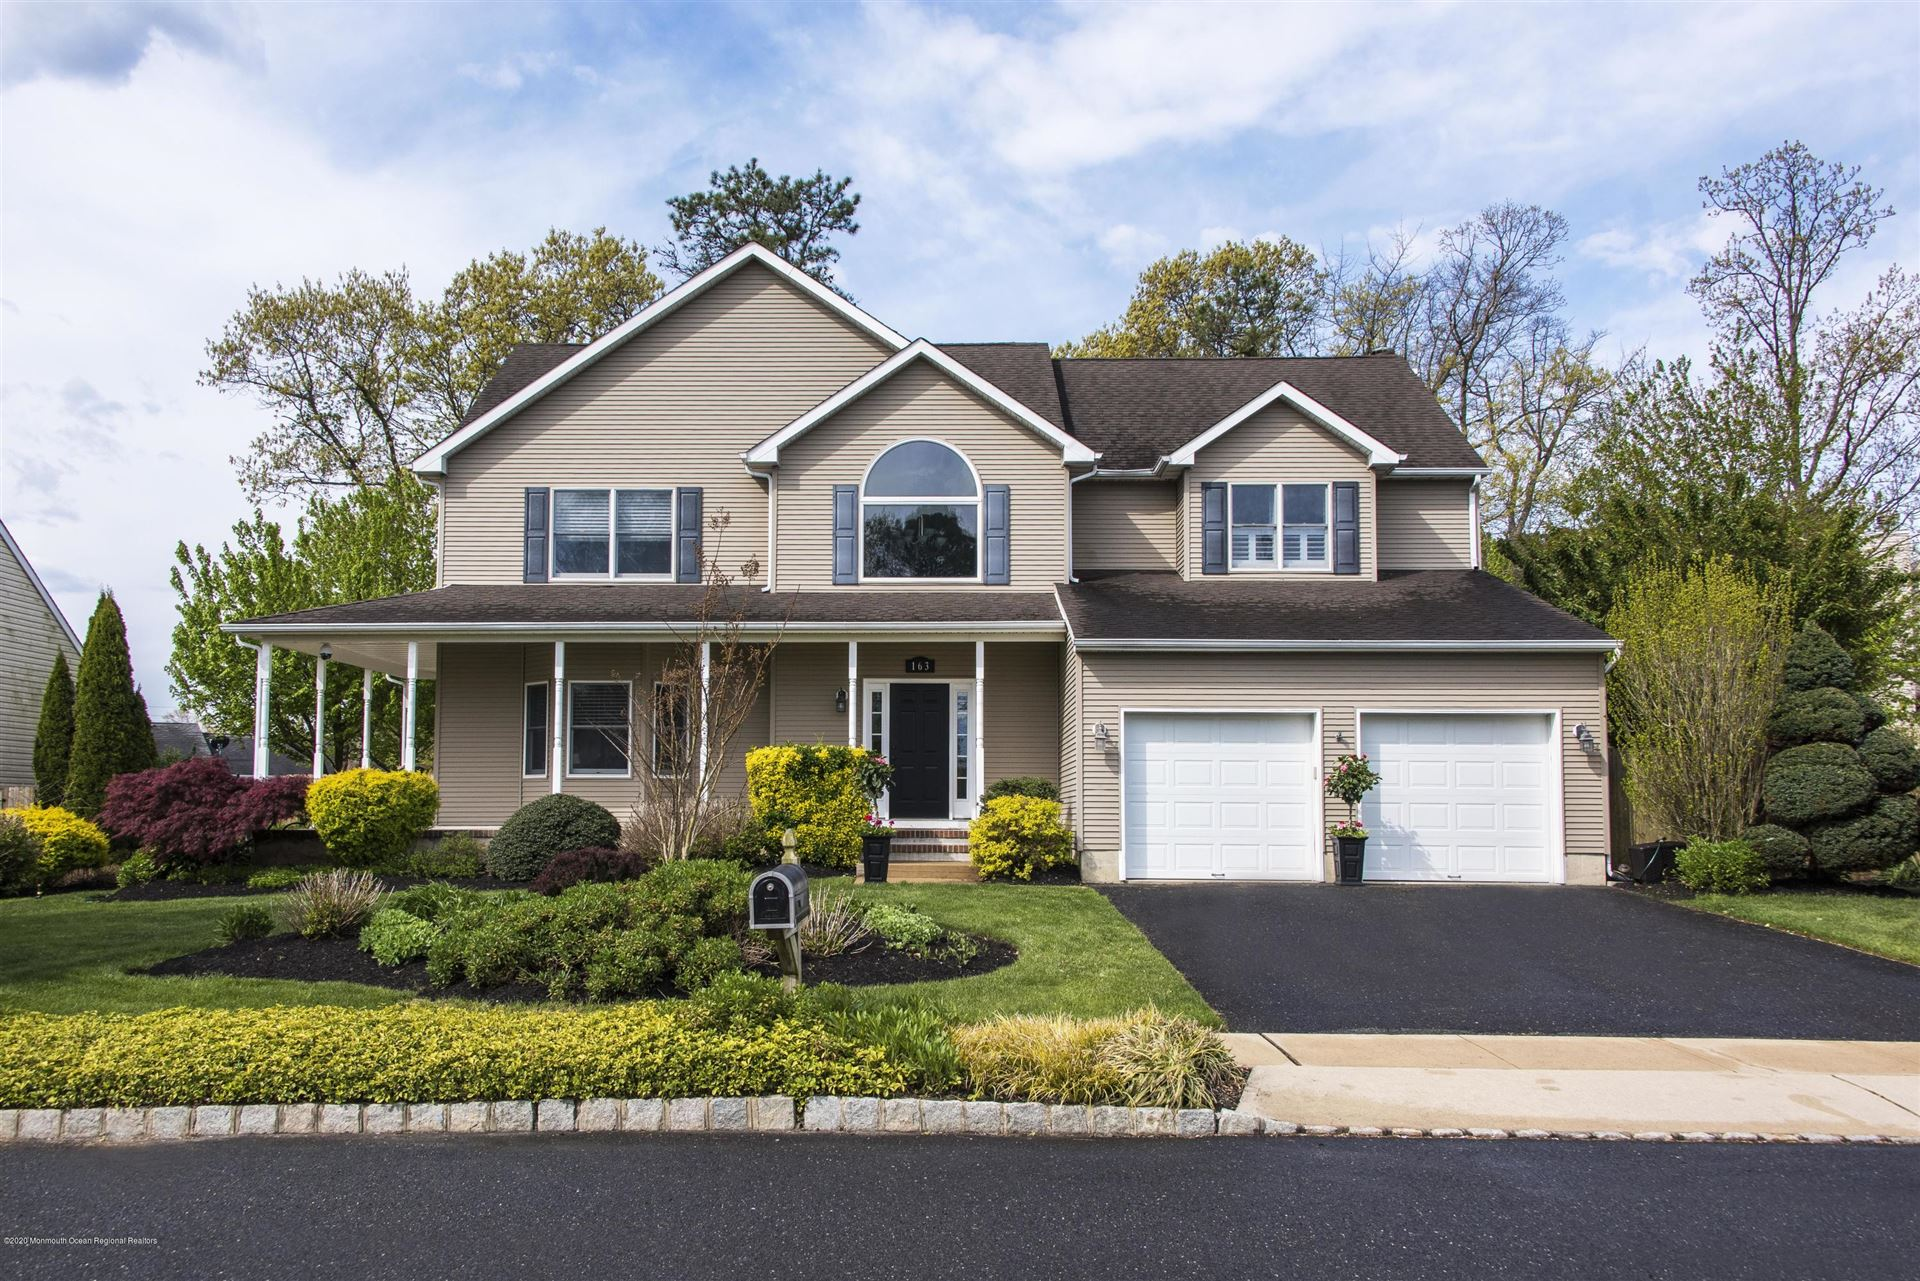 163 Duchess Lane, Brick, NJ 08724 - #: 22019099